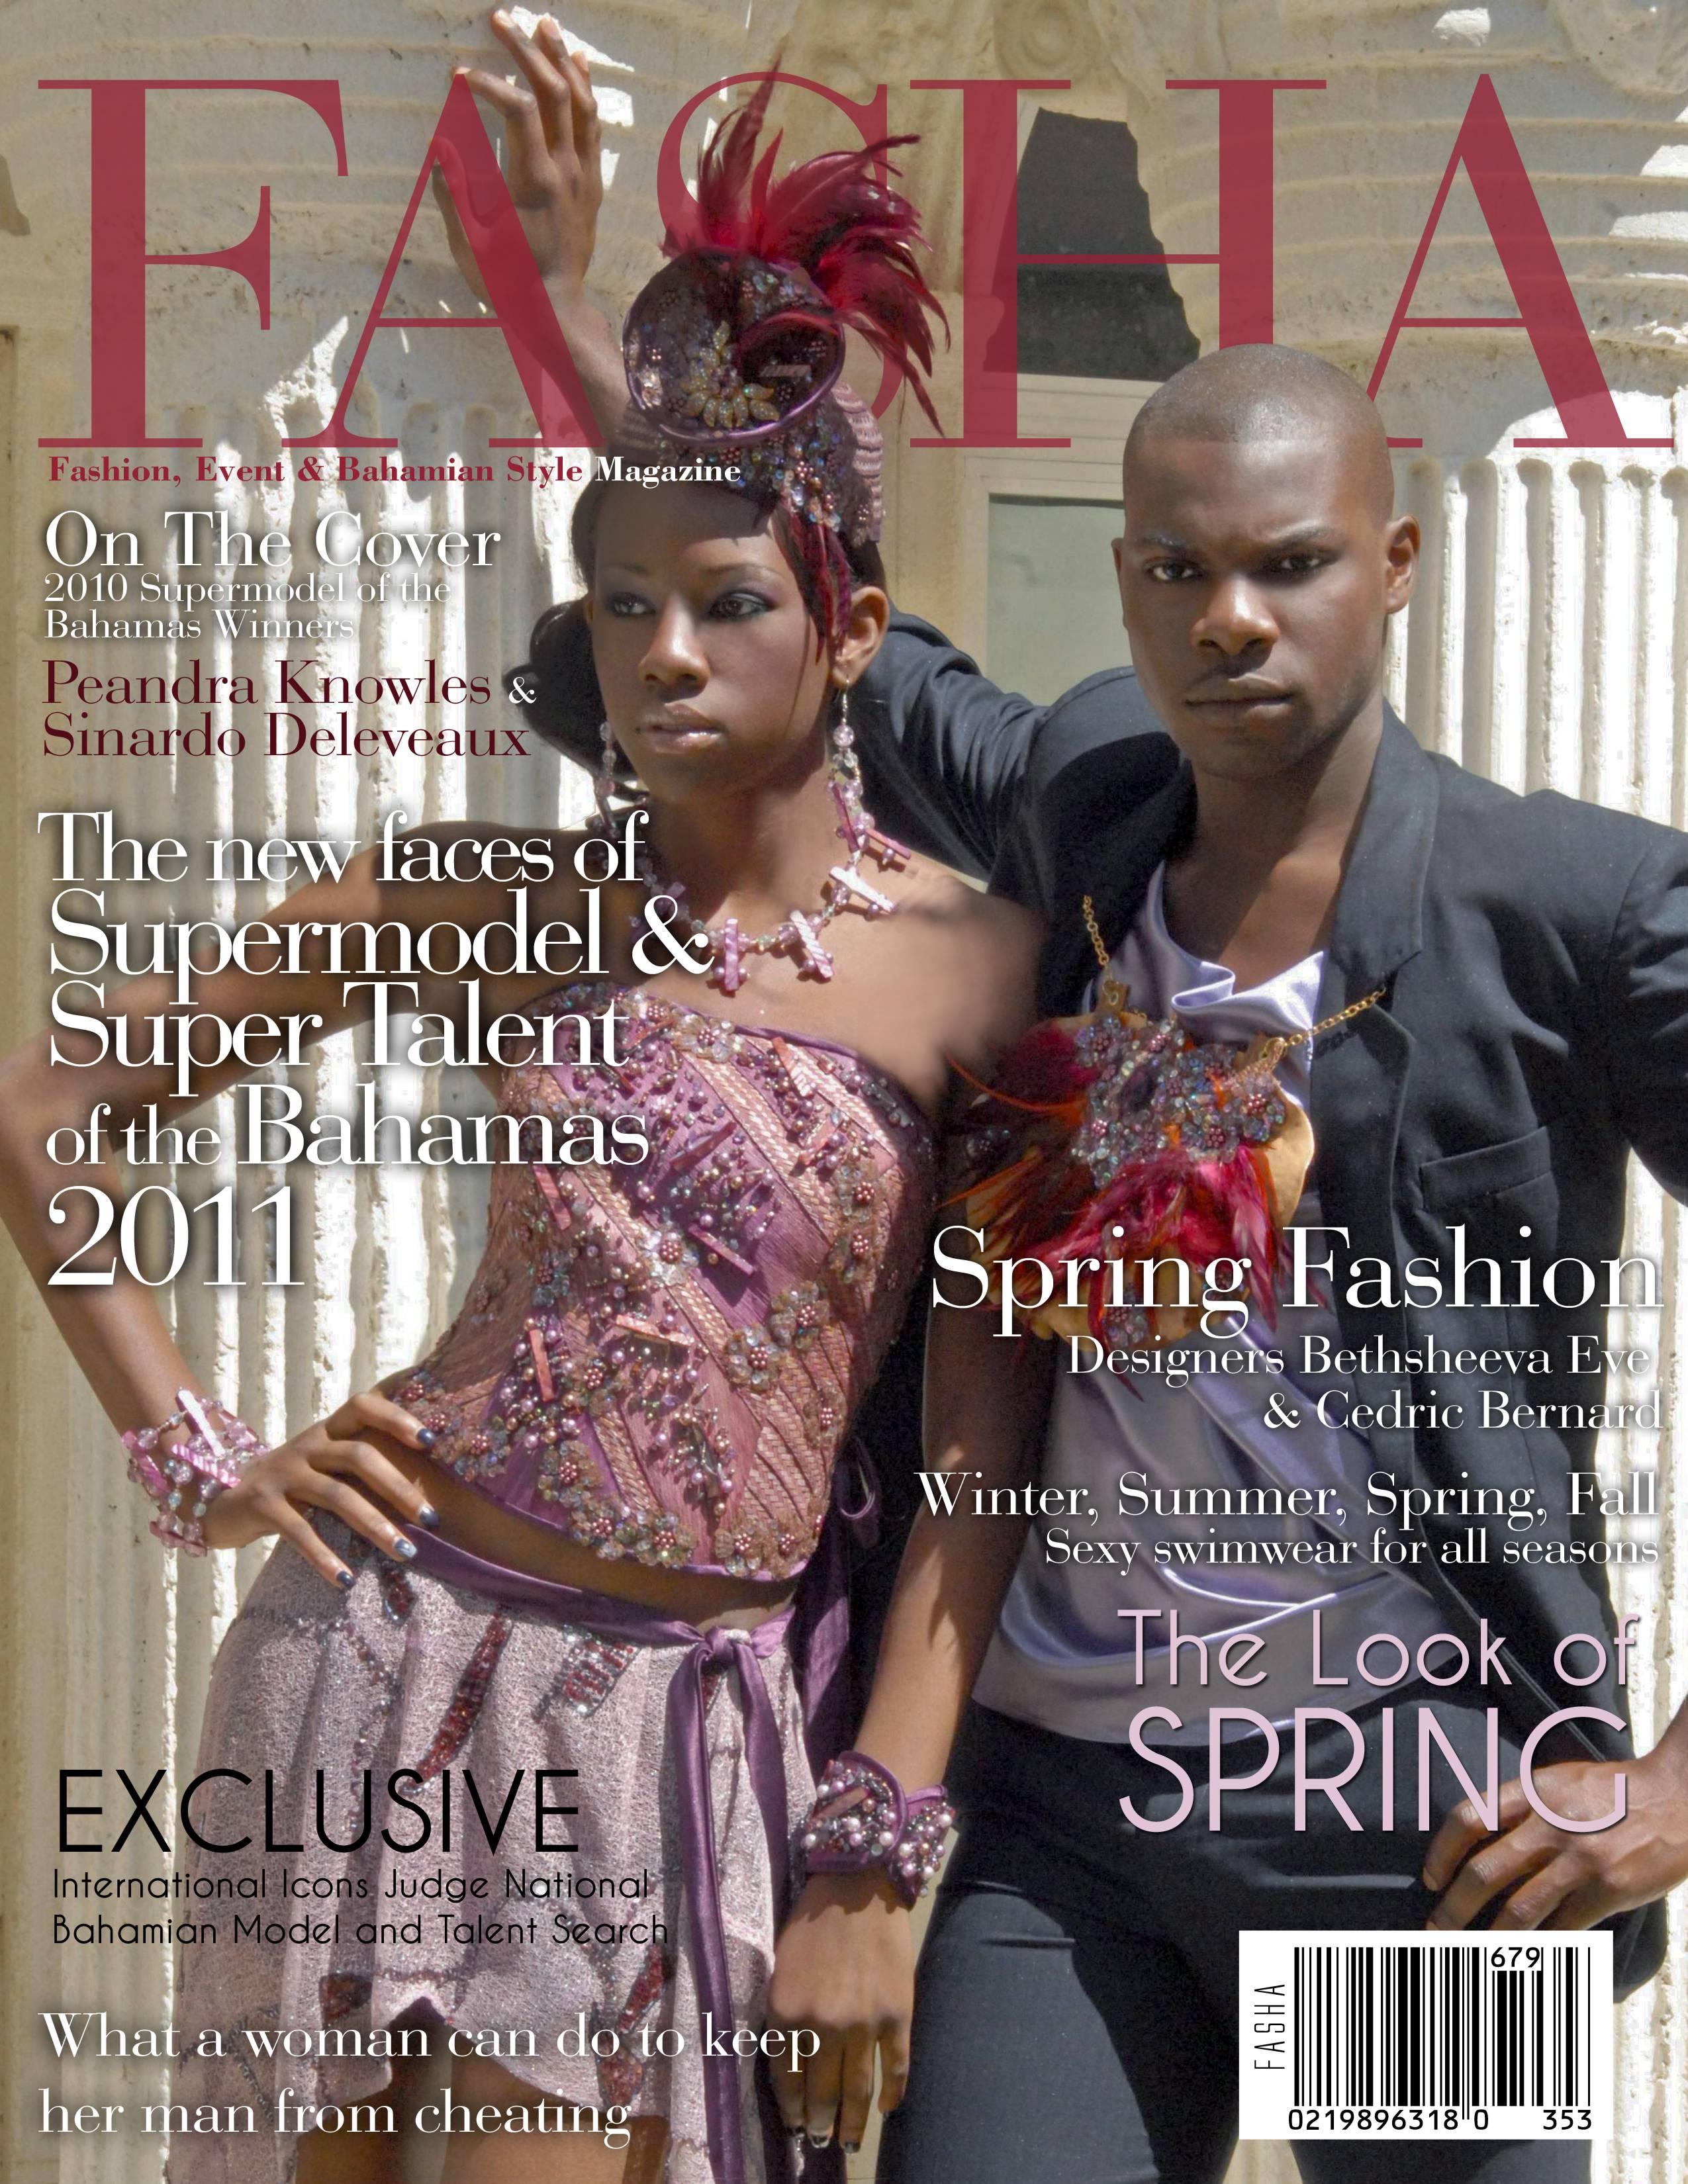 2010 Supermodel winners